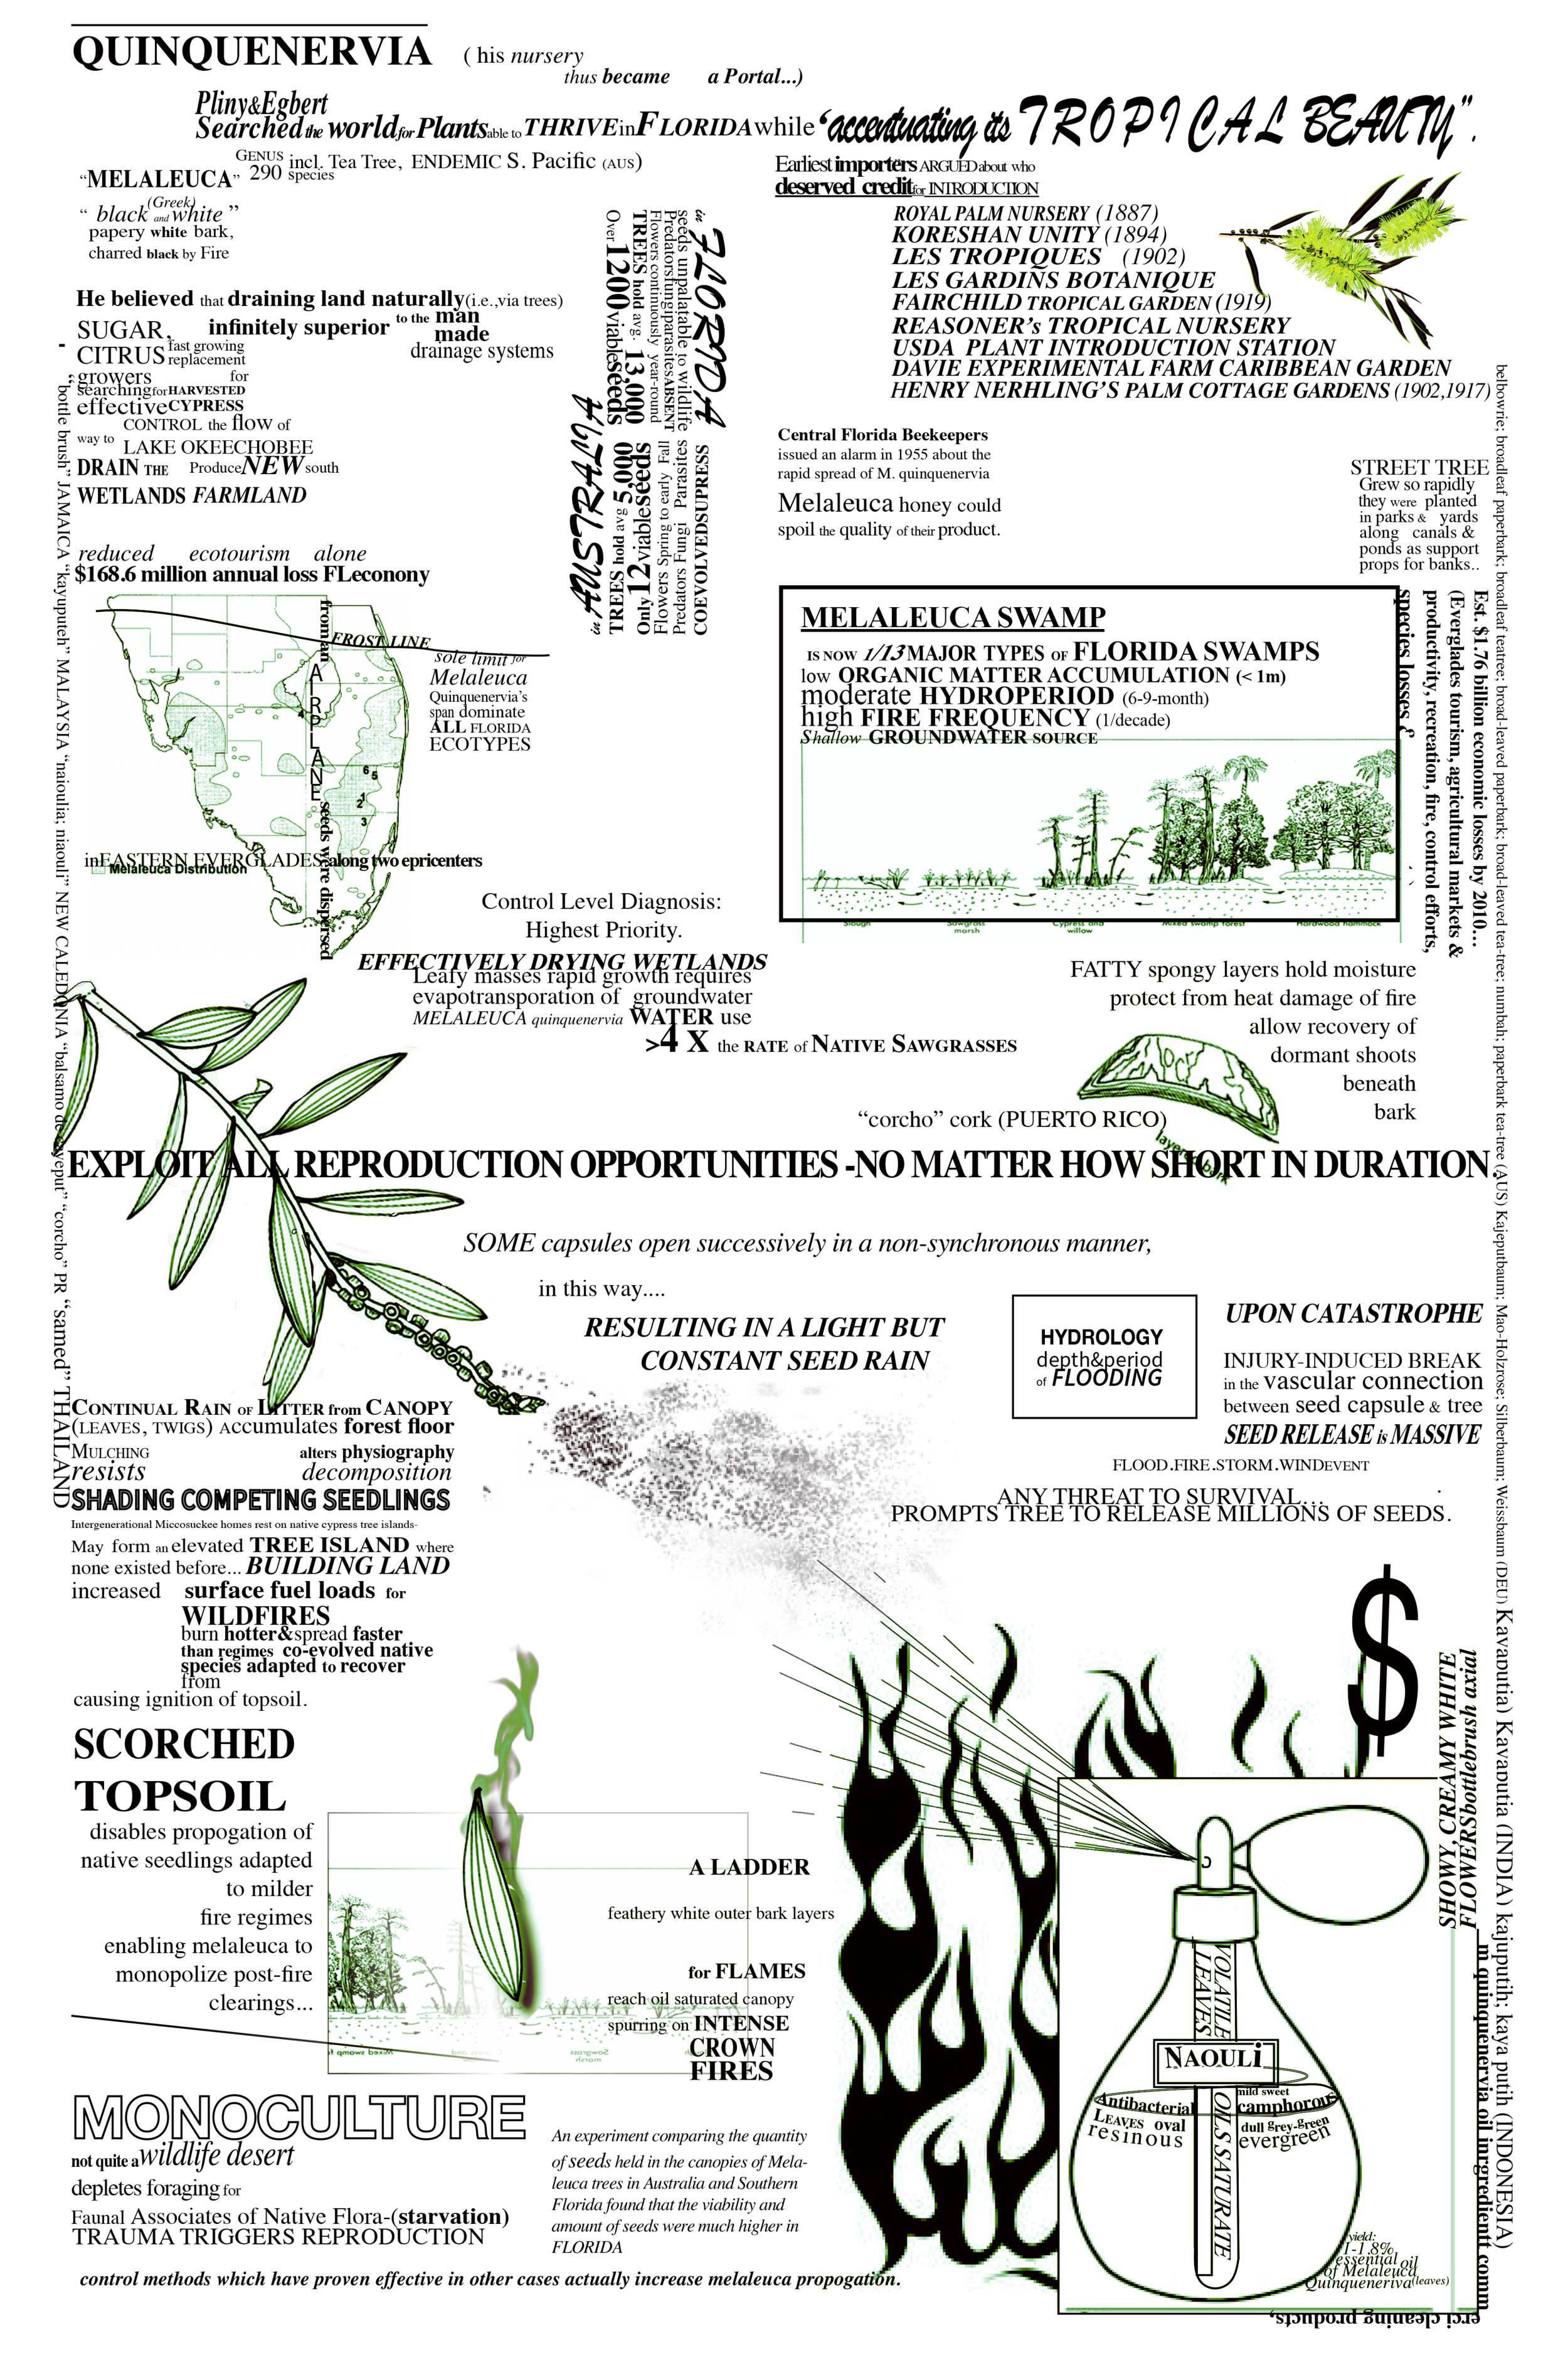 Melaleuca__11x17_rework_inprogress5_green.png